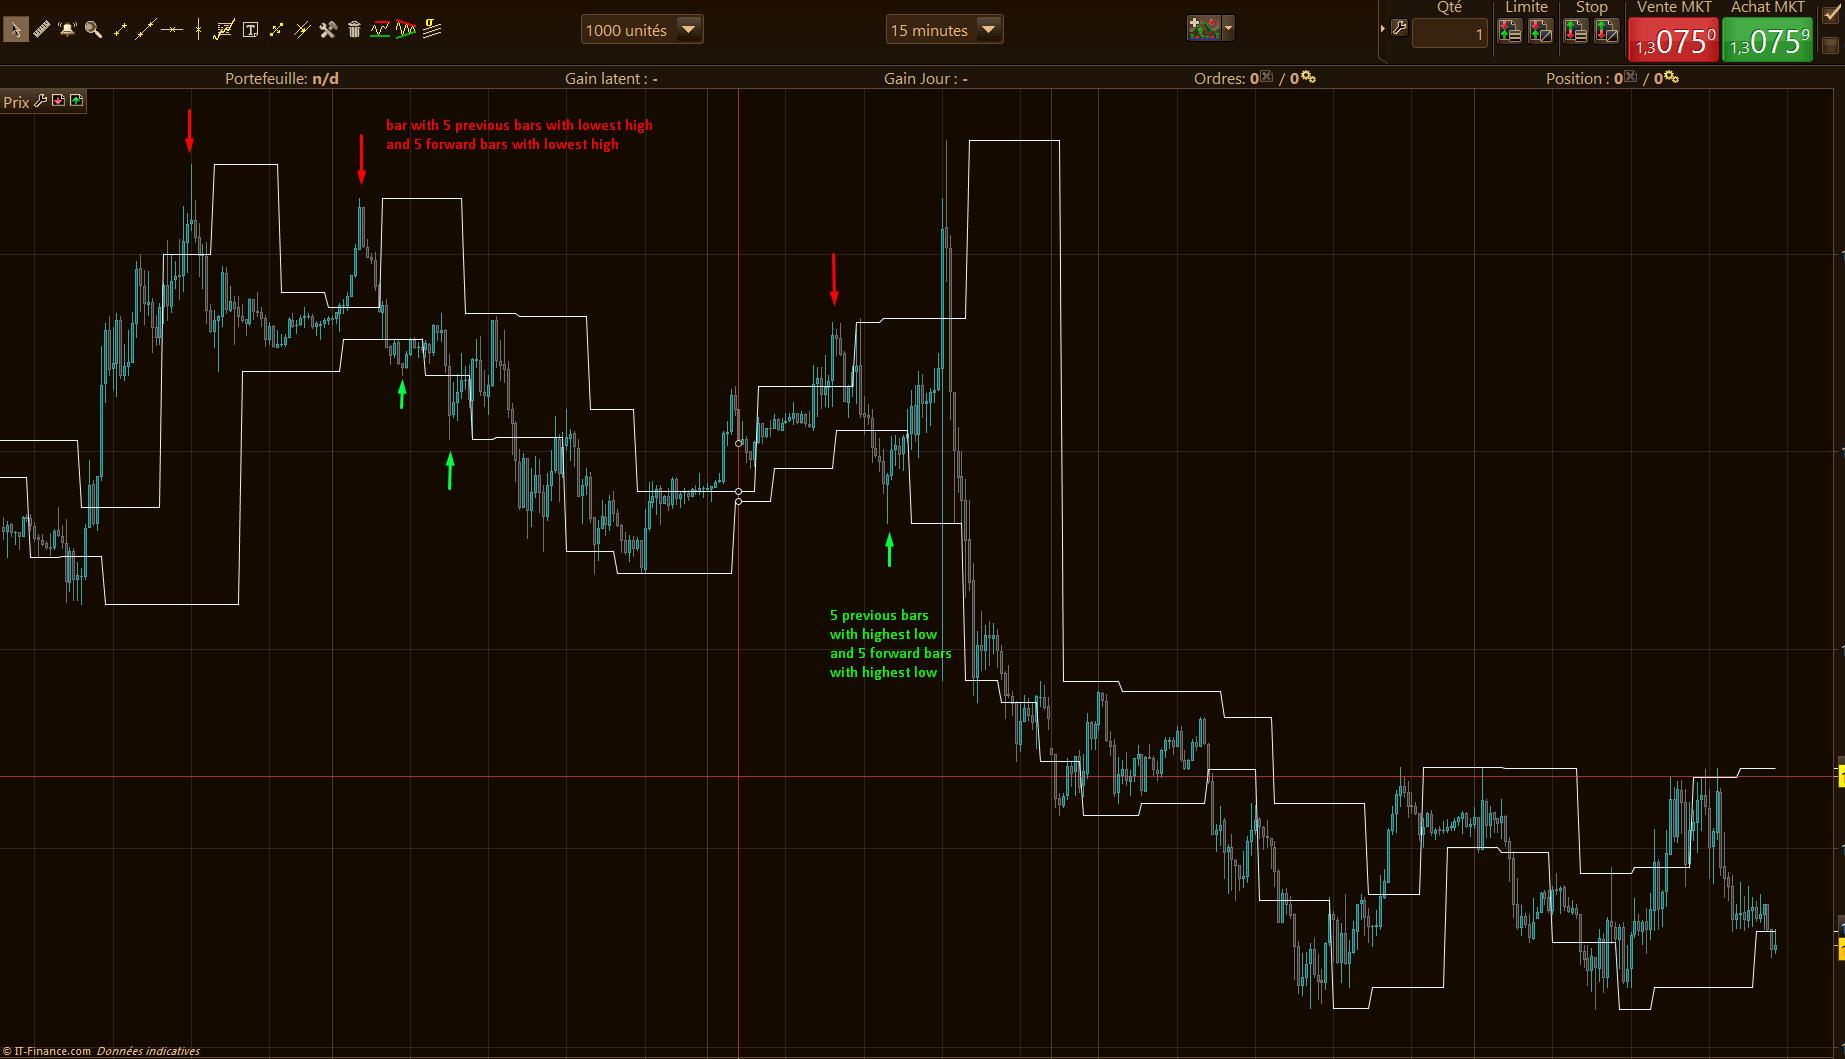 Bar Count Reversals (Pivot Points High/Low) | Indicators